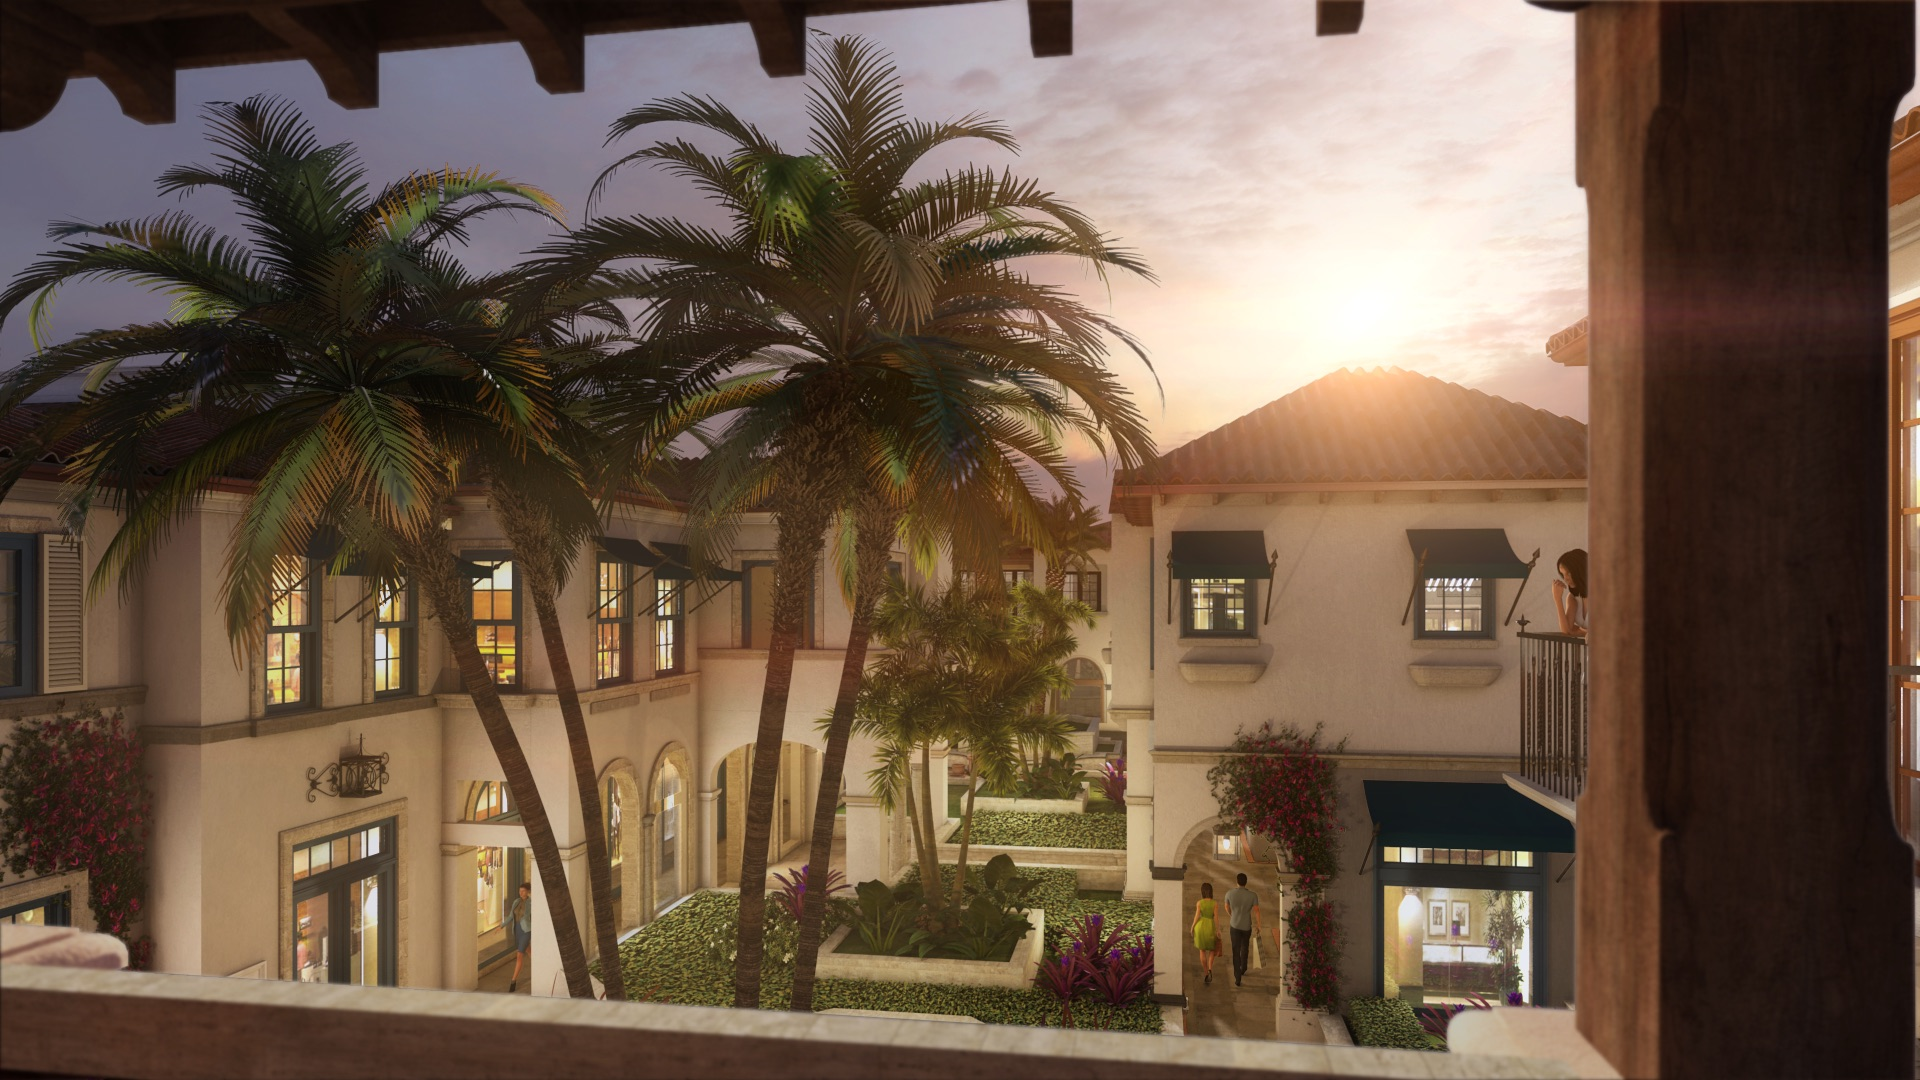 Royal Poinciana Palm Beach Courtyard